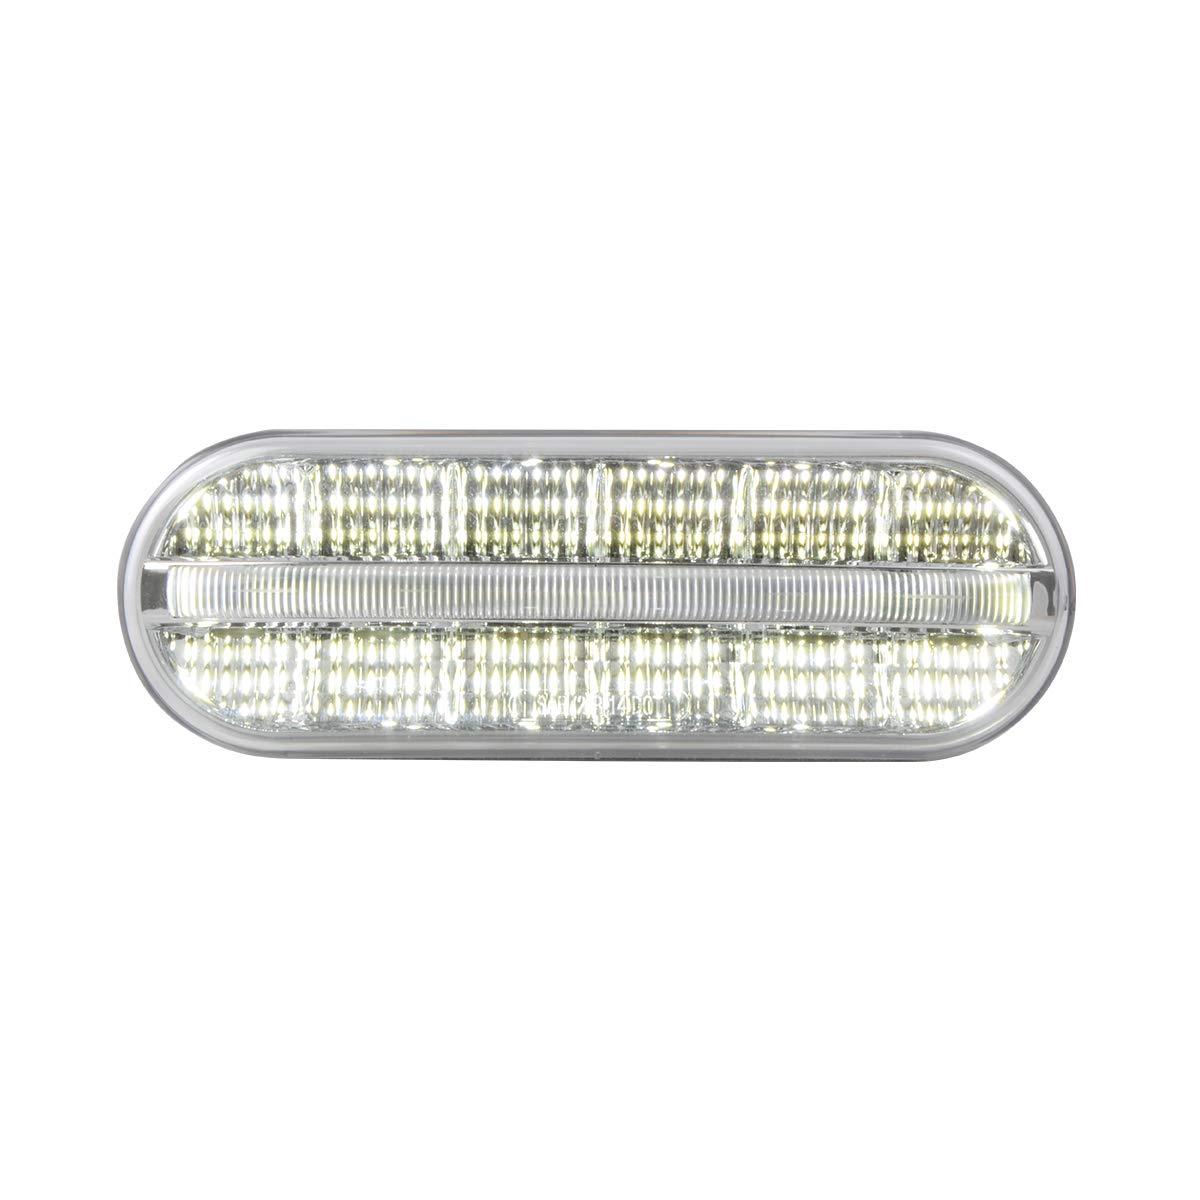 GG Grand General 74854 Sealed Light Oval Prime Spyder White//Clear 14 LED